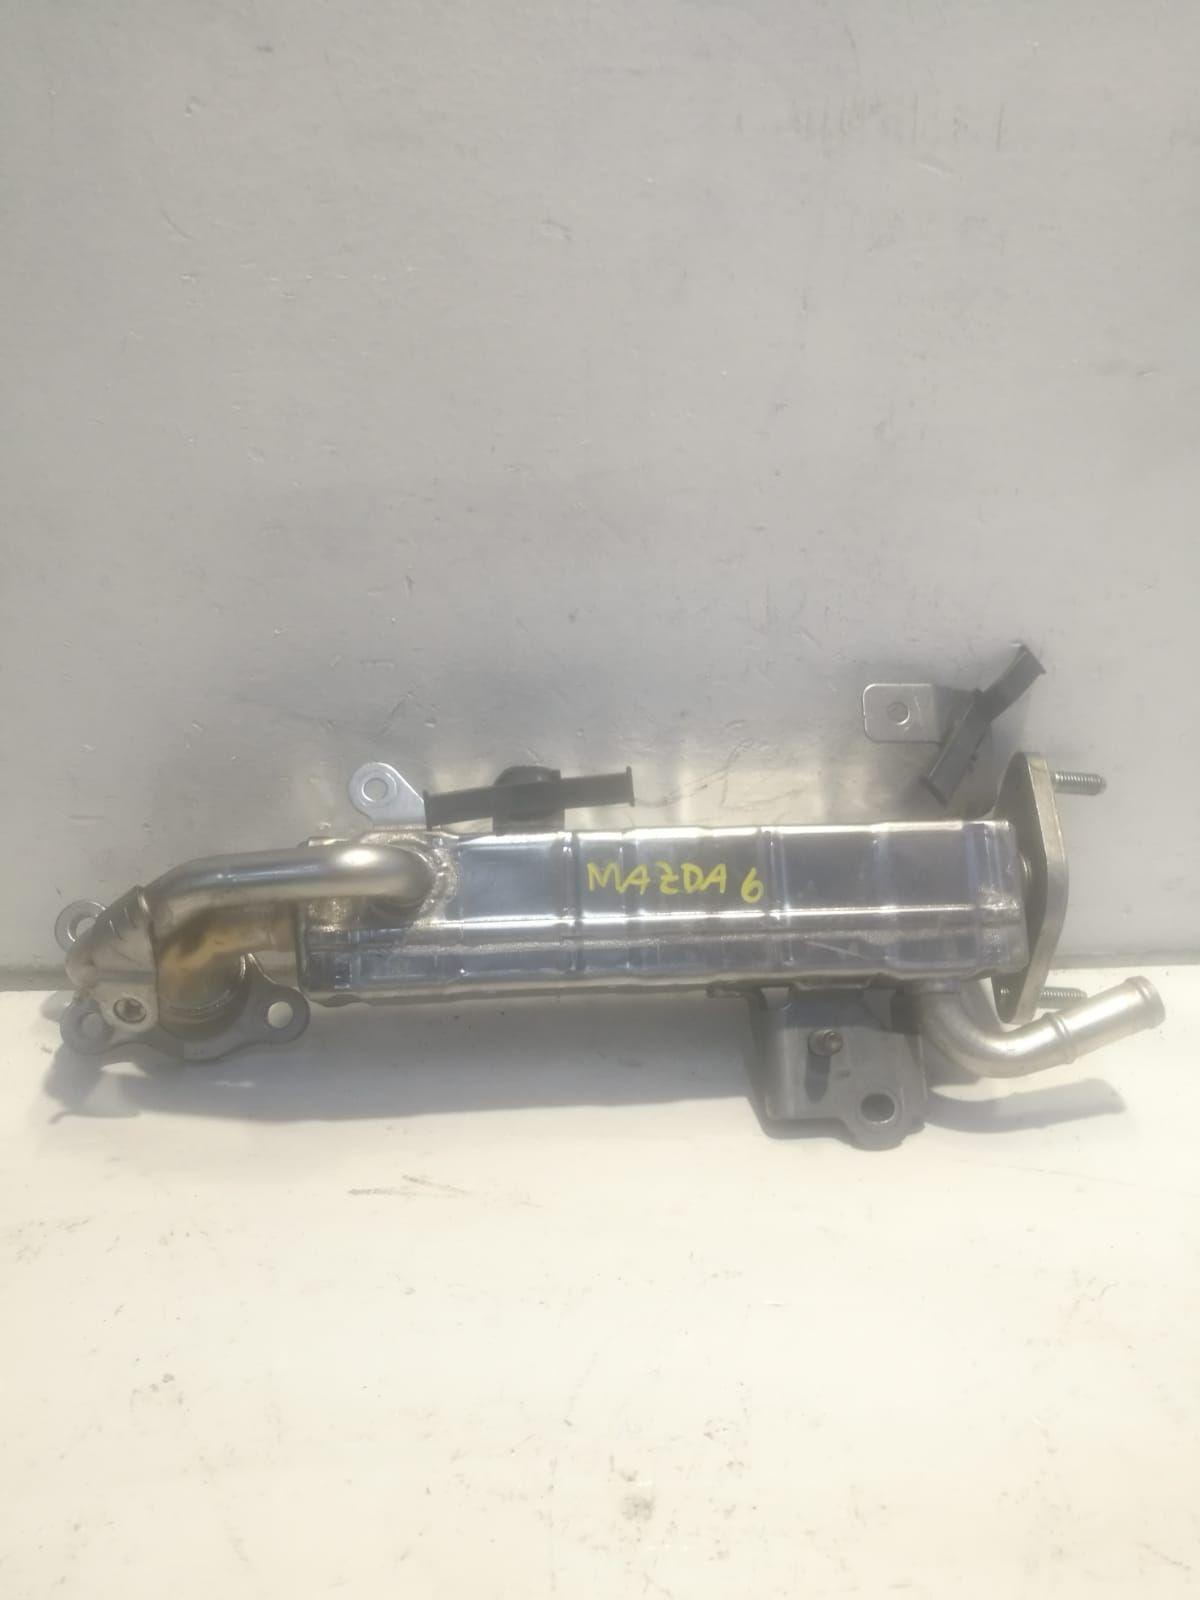 SH012030Y / 27B13A-0158 SCAMBIATORE EGR MAZDA 6 3 serie S. Wagon (12>) 2200 Diesel SH  (2016) RICAMBI USATI